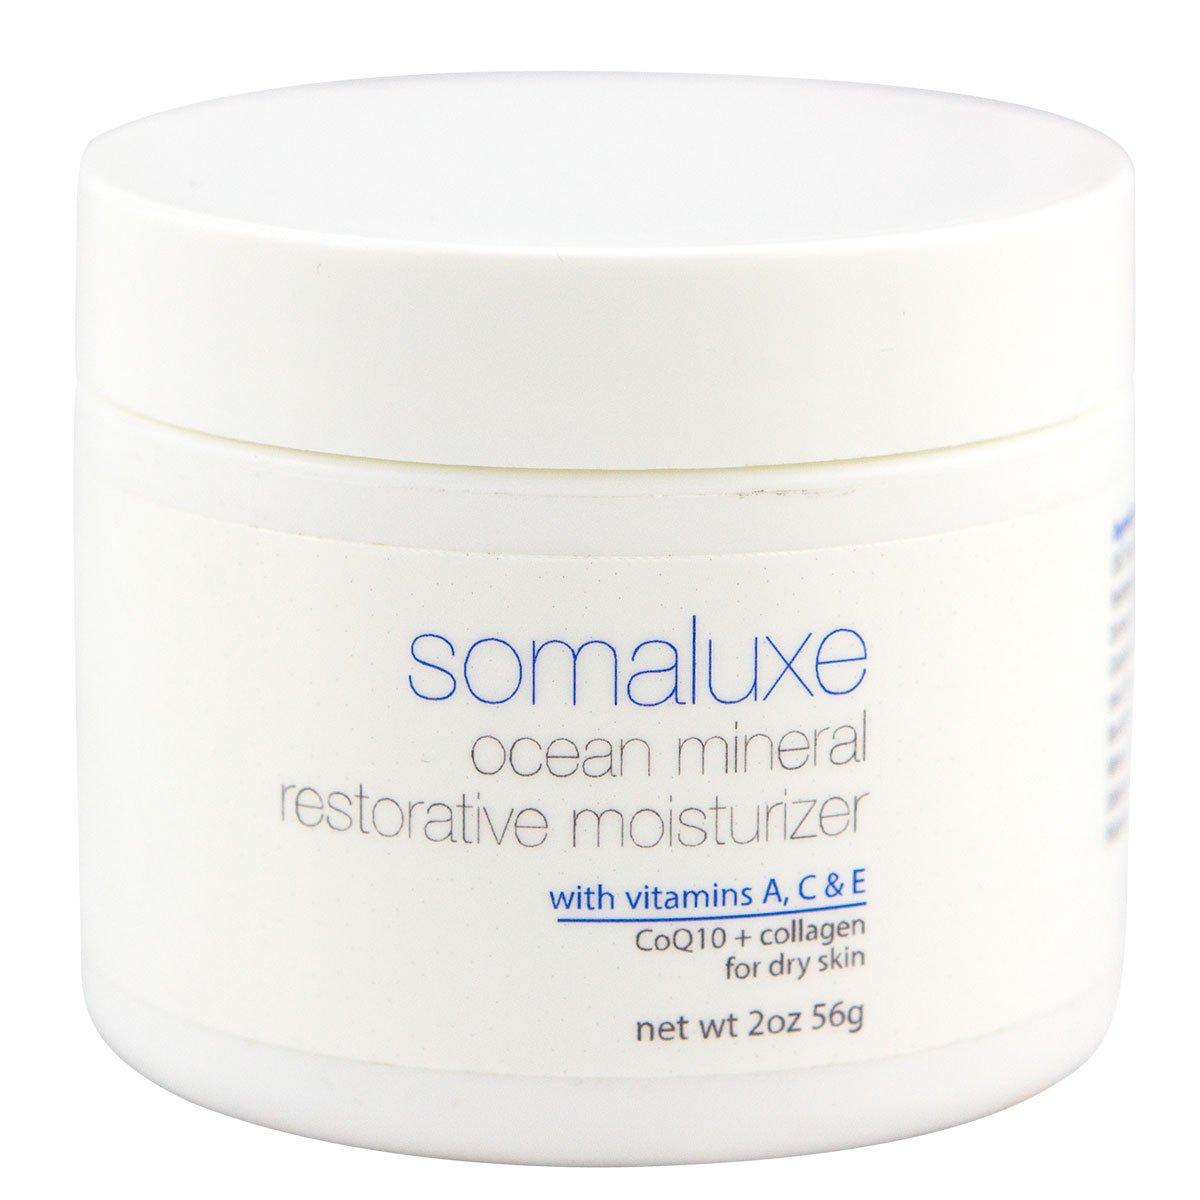 Restorative Moisturizer | CoQ10 + Collagen + Vitamins A, C & E | Daily for Flawless & Soft Complexion, 2oz